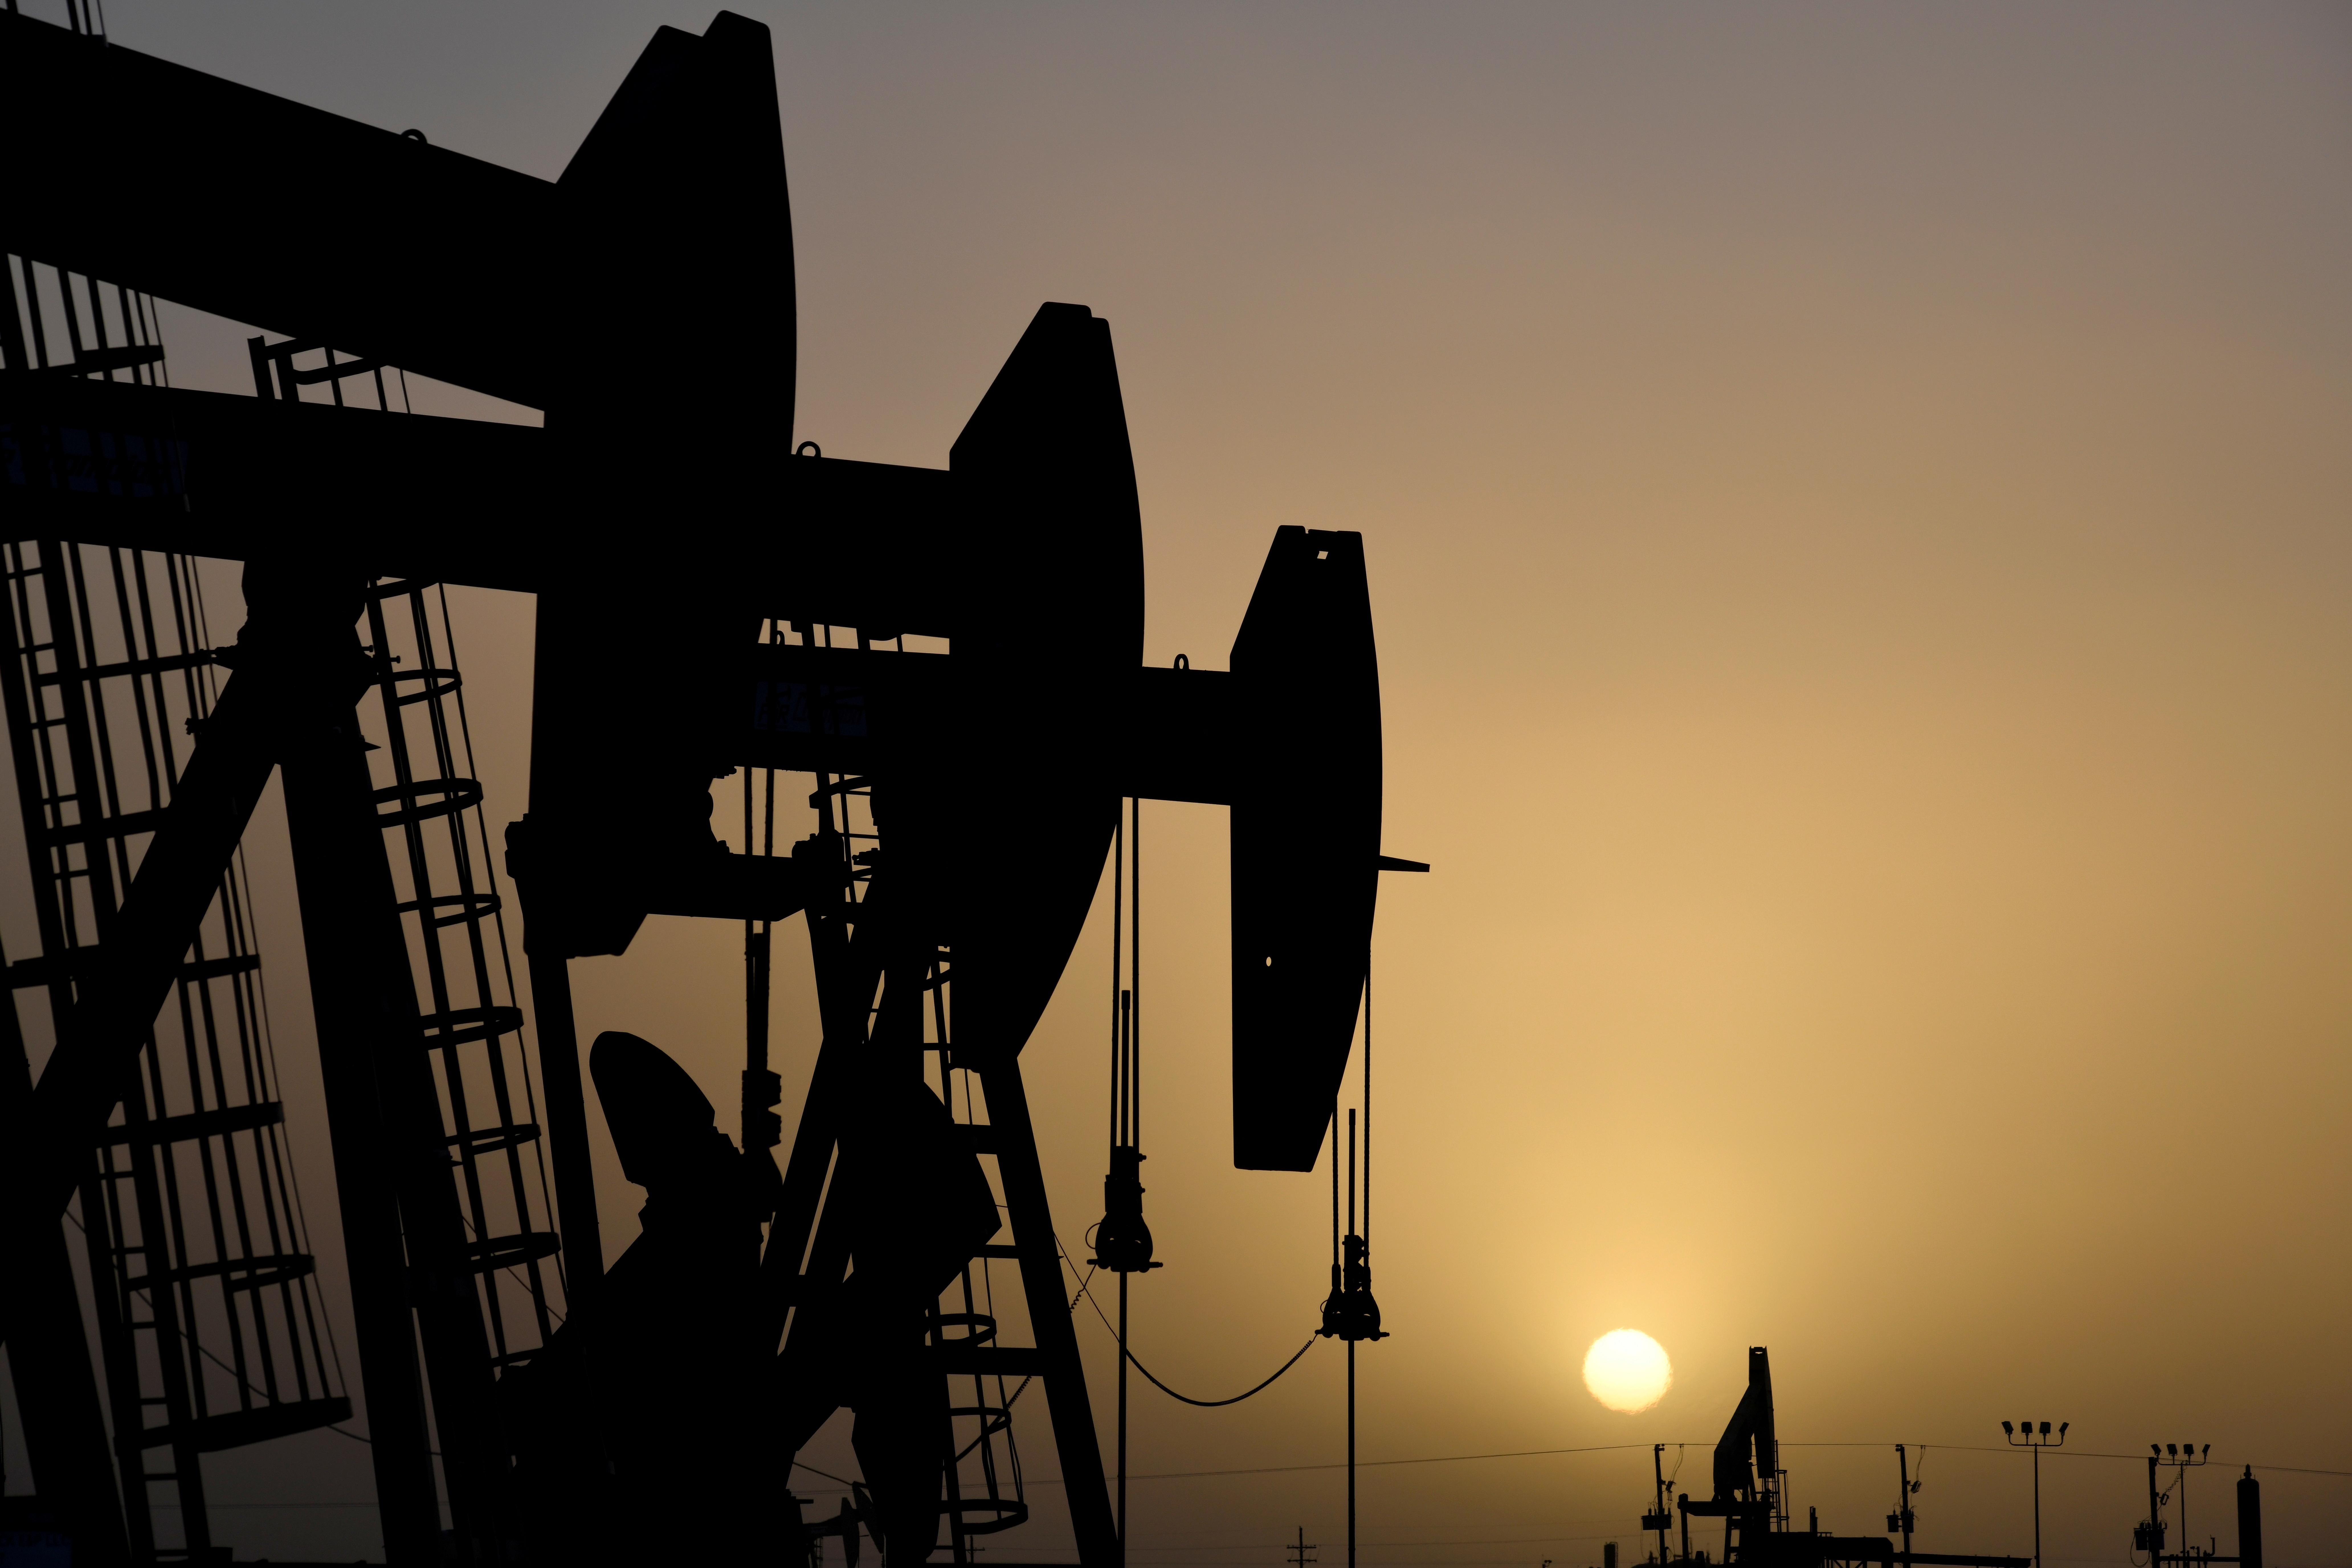 Pump jacks operate at sunset in Midland, Texas, U.S., February 11, 2019. REUTERS/Nick Oxford